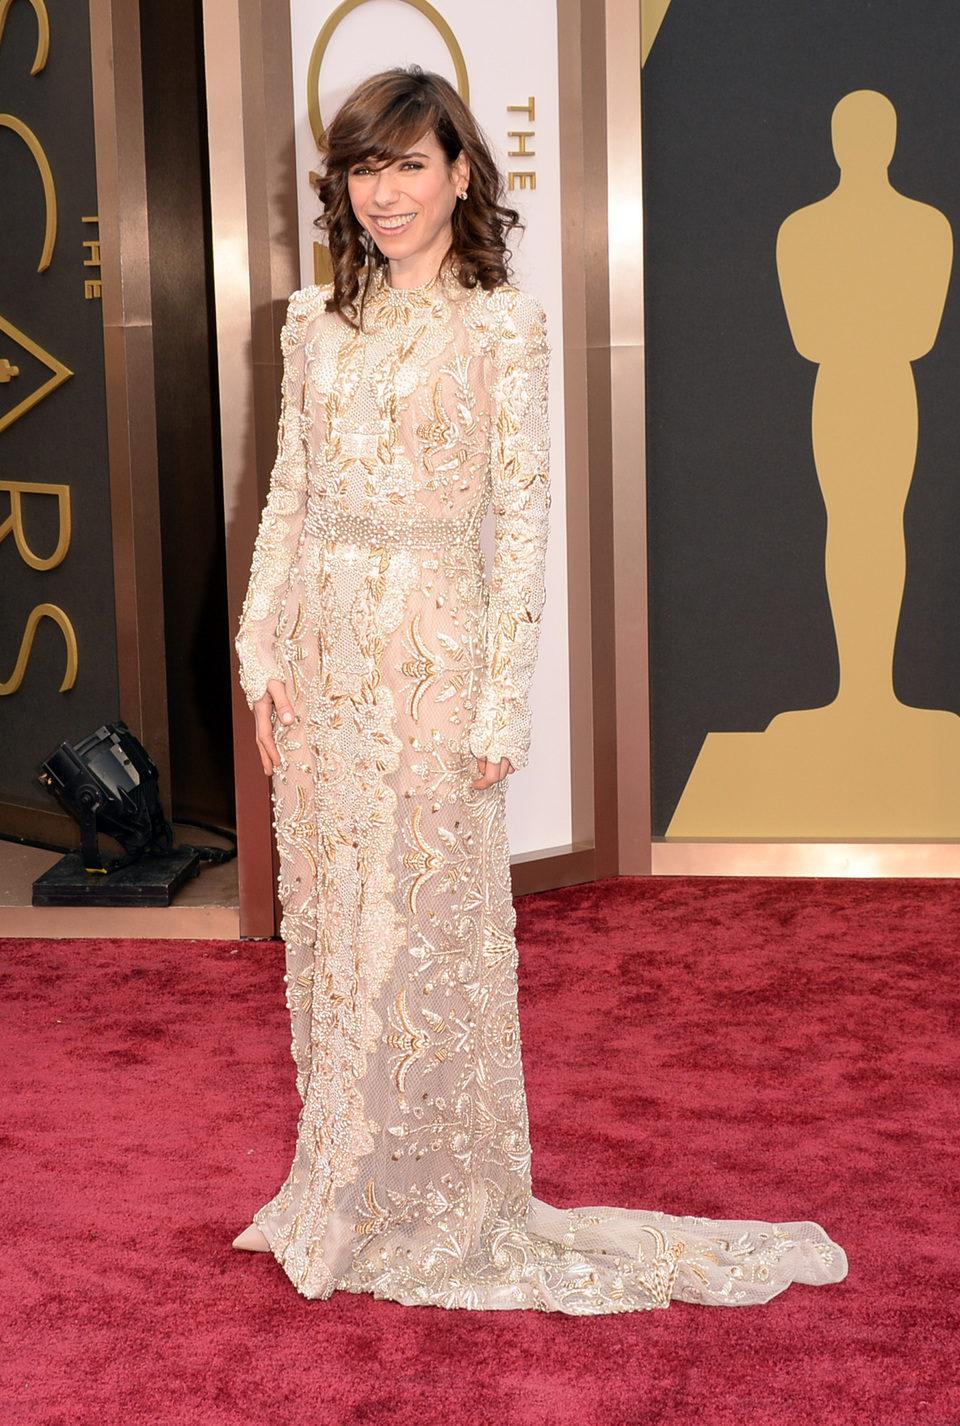 Sally Hawkins at the 2014 Oscars